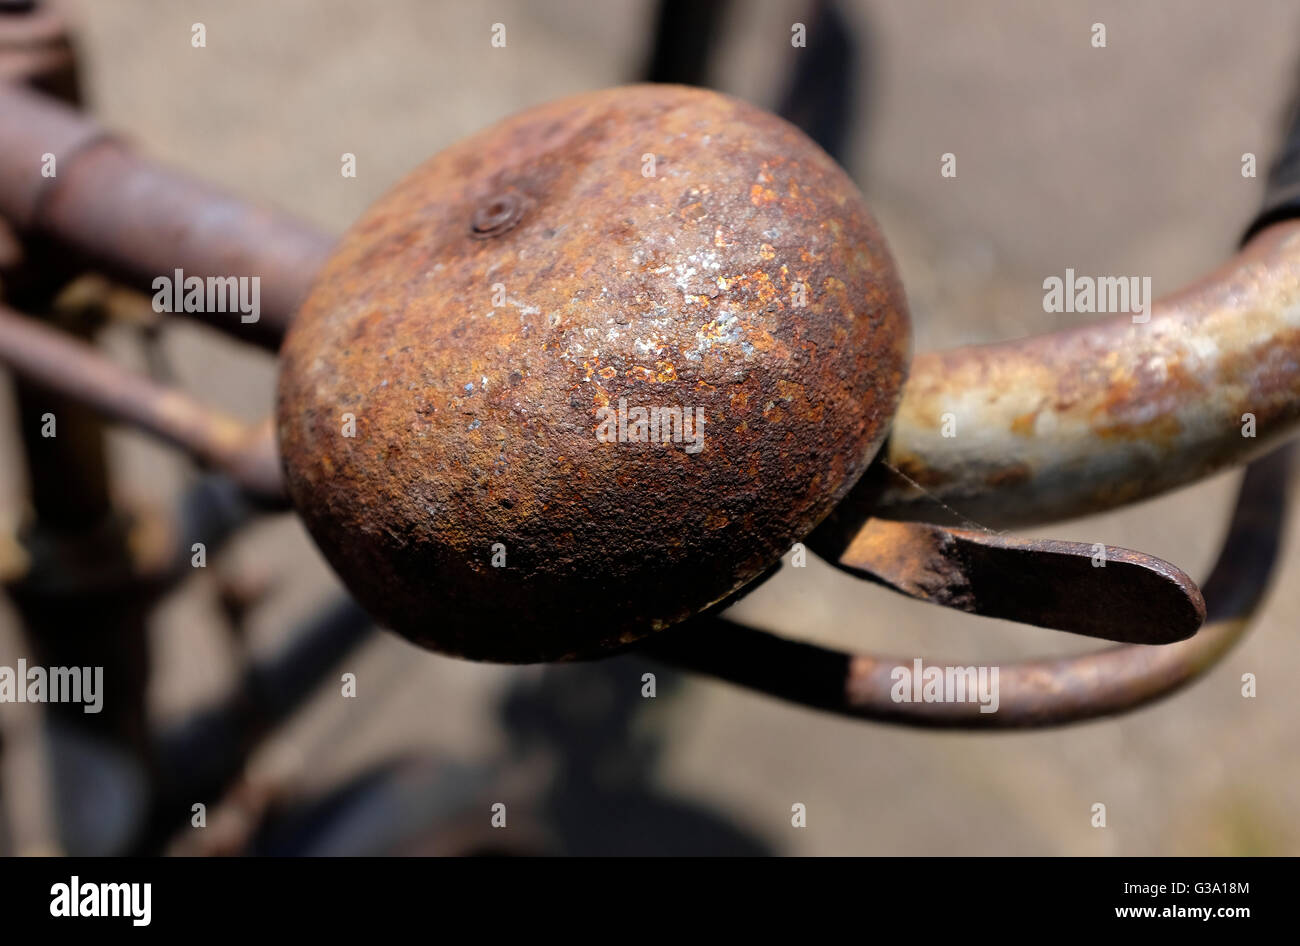 old rusty metal bicycle bell on handlebars - Stock Image